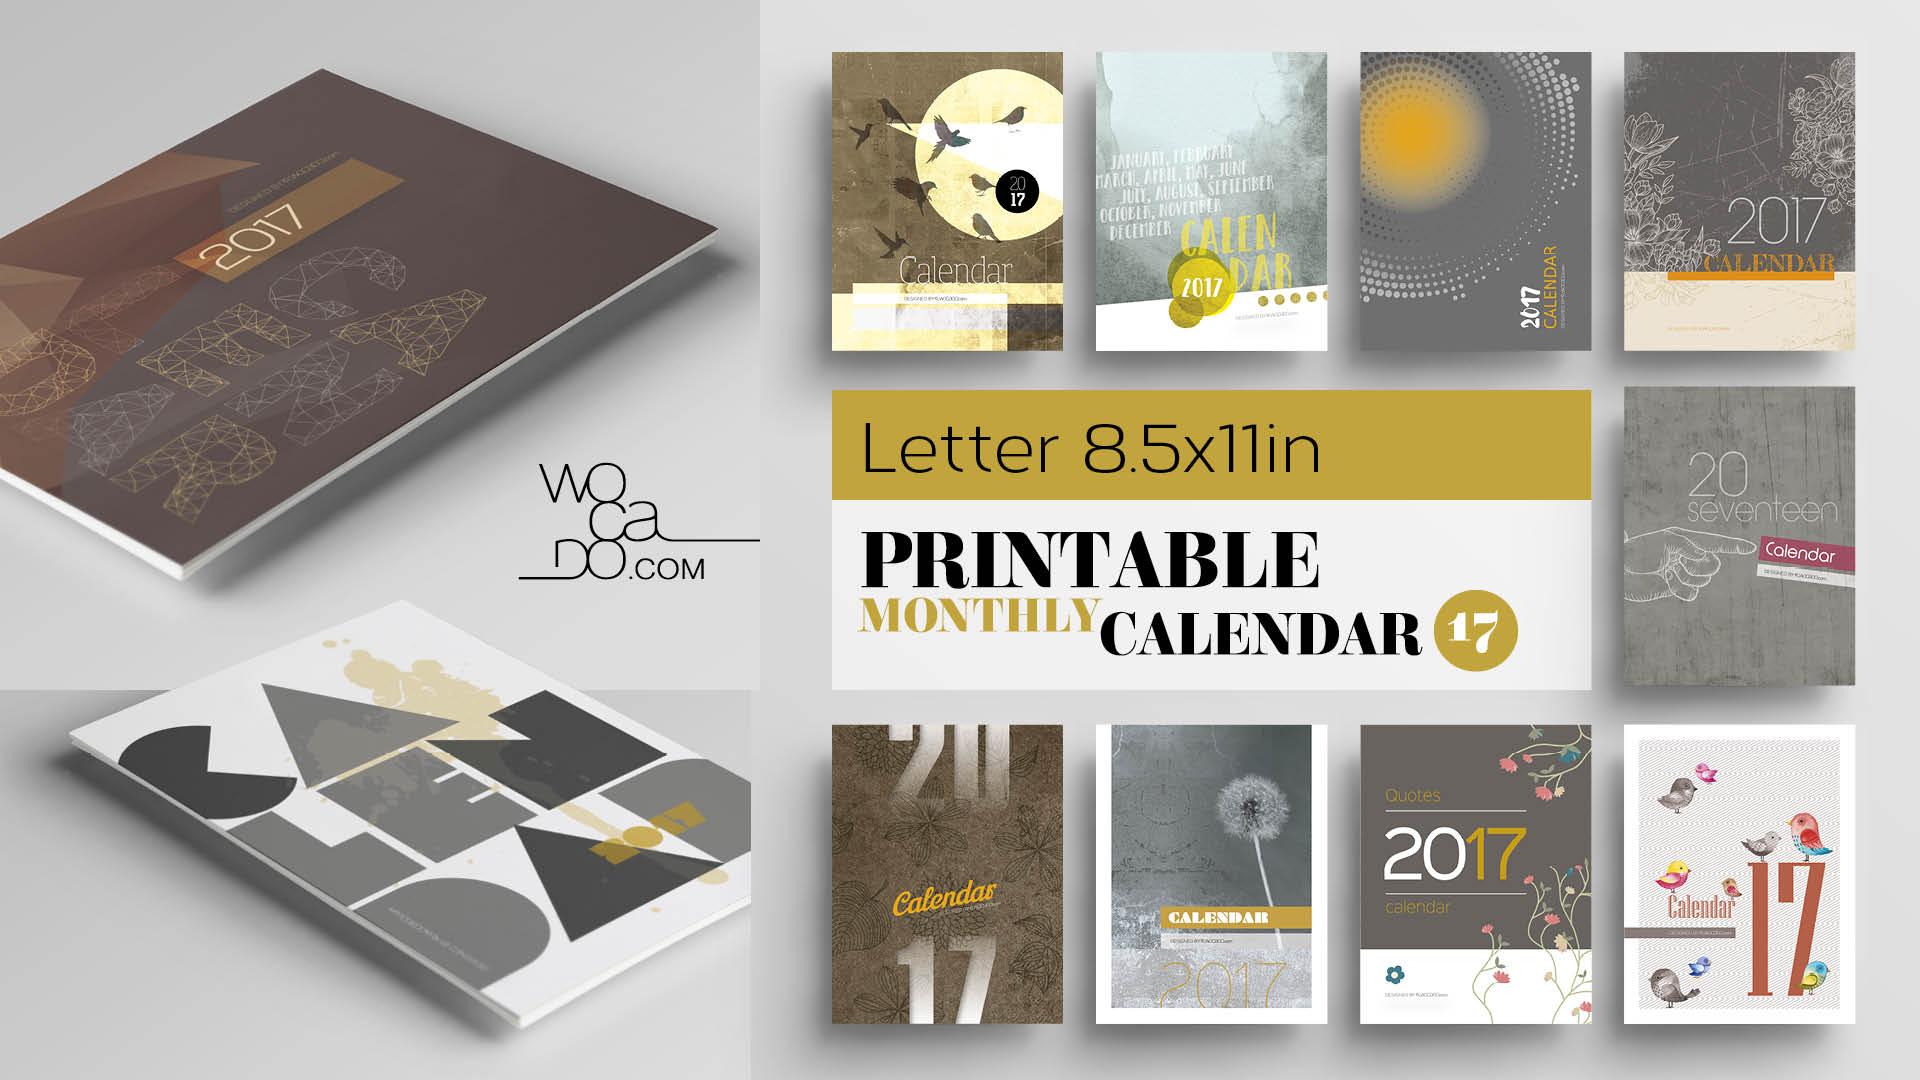 Printable Calendars 2017 by WOCADO